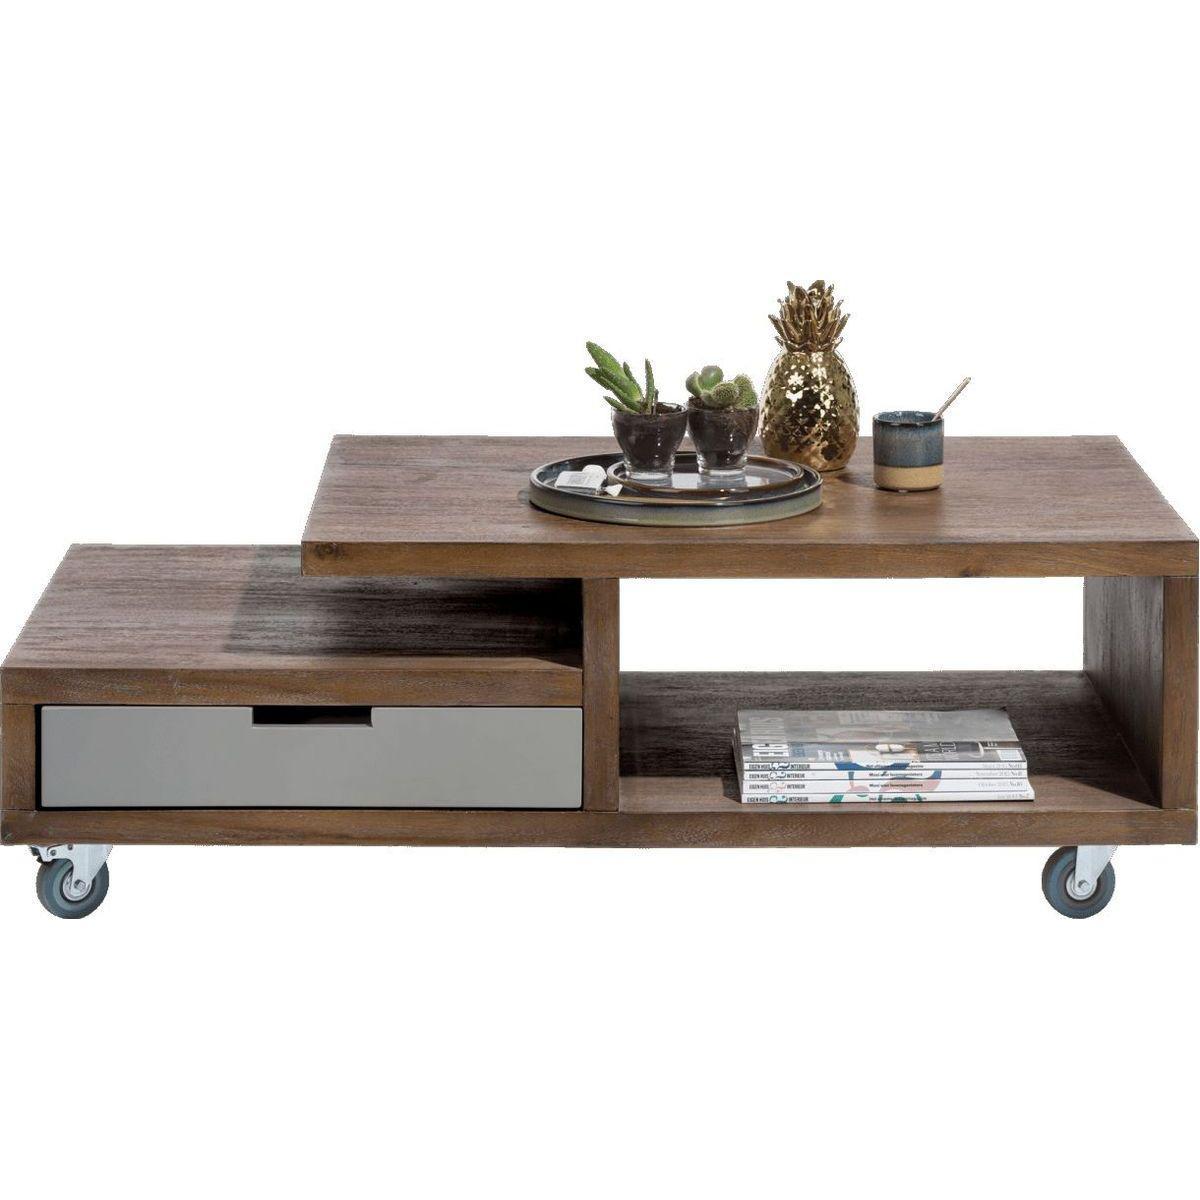 Table basse BOX HetH 60x120cm Tramwood Walnut gris